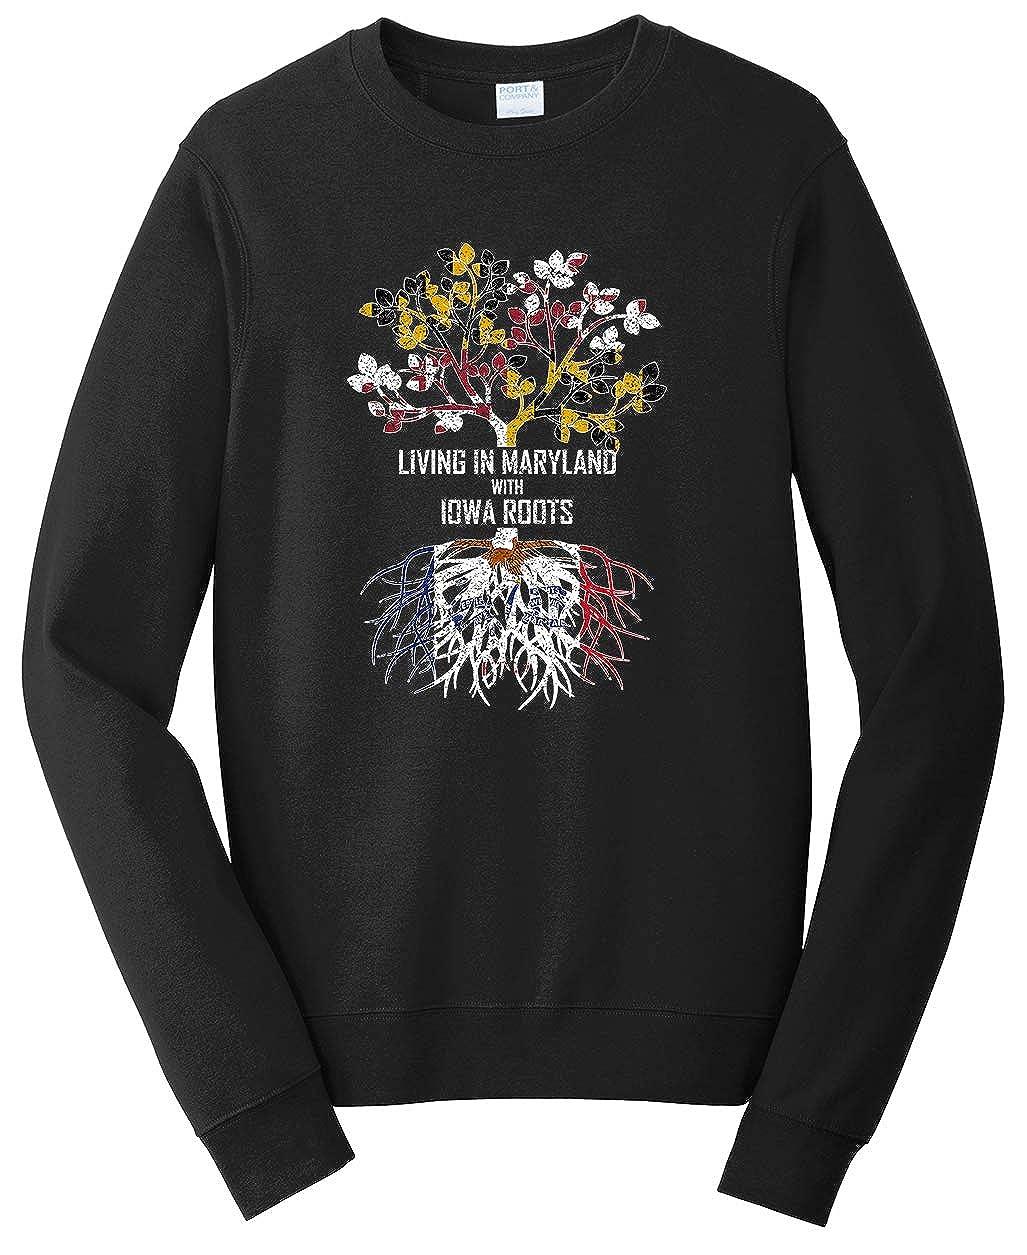 Tenacitee Unisex Living in Maryland Iowa Roots Sweatshirt